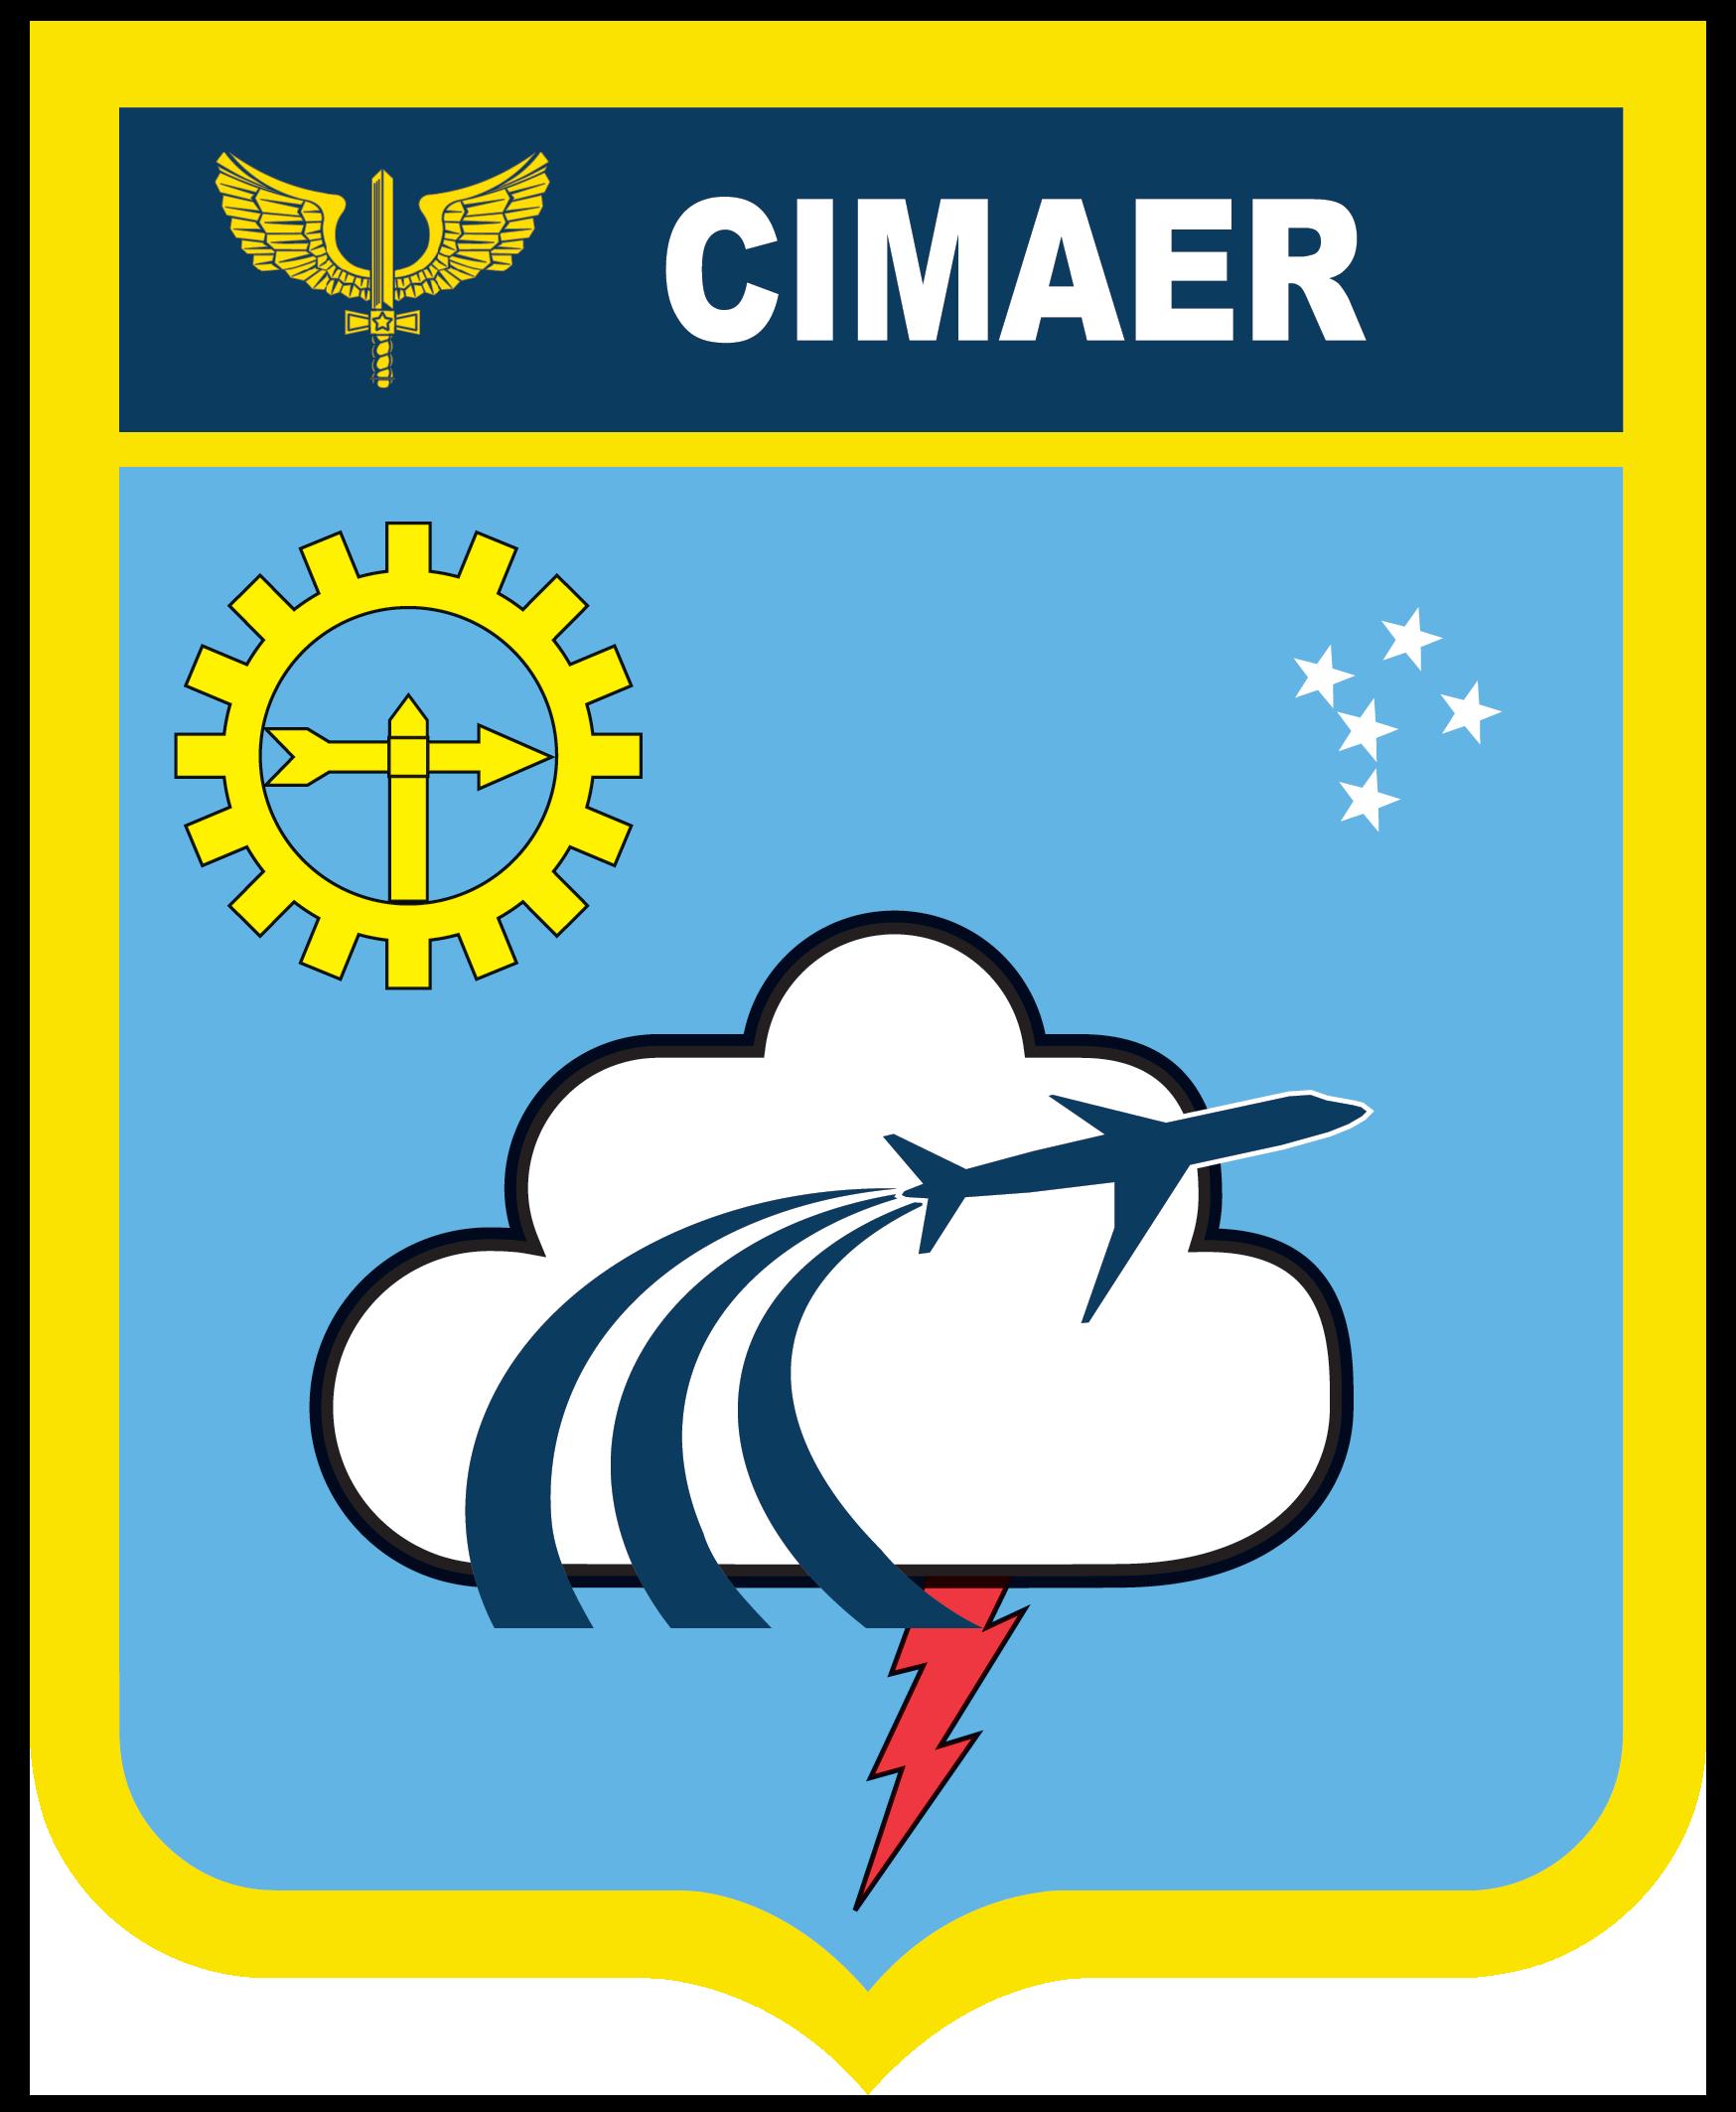 CIMAER